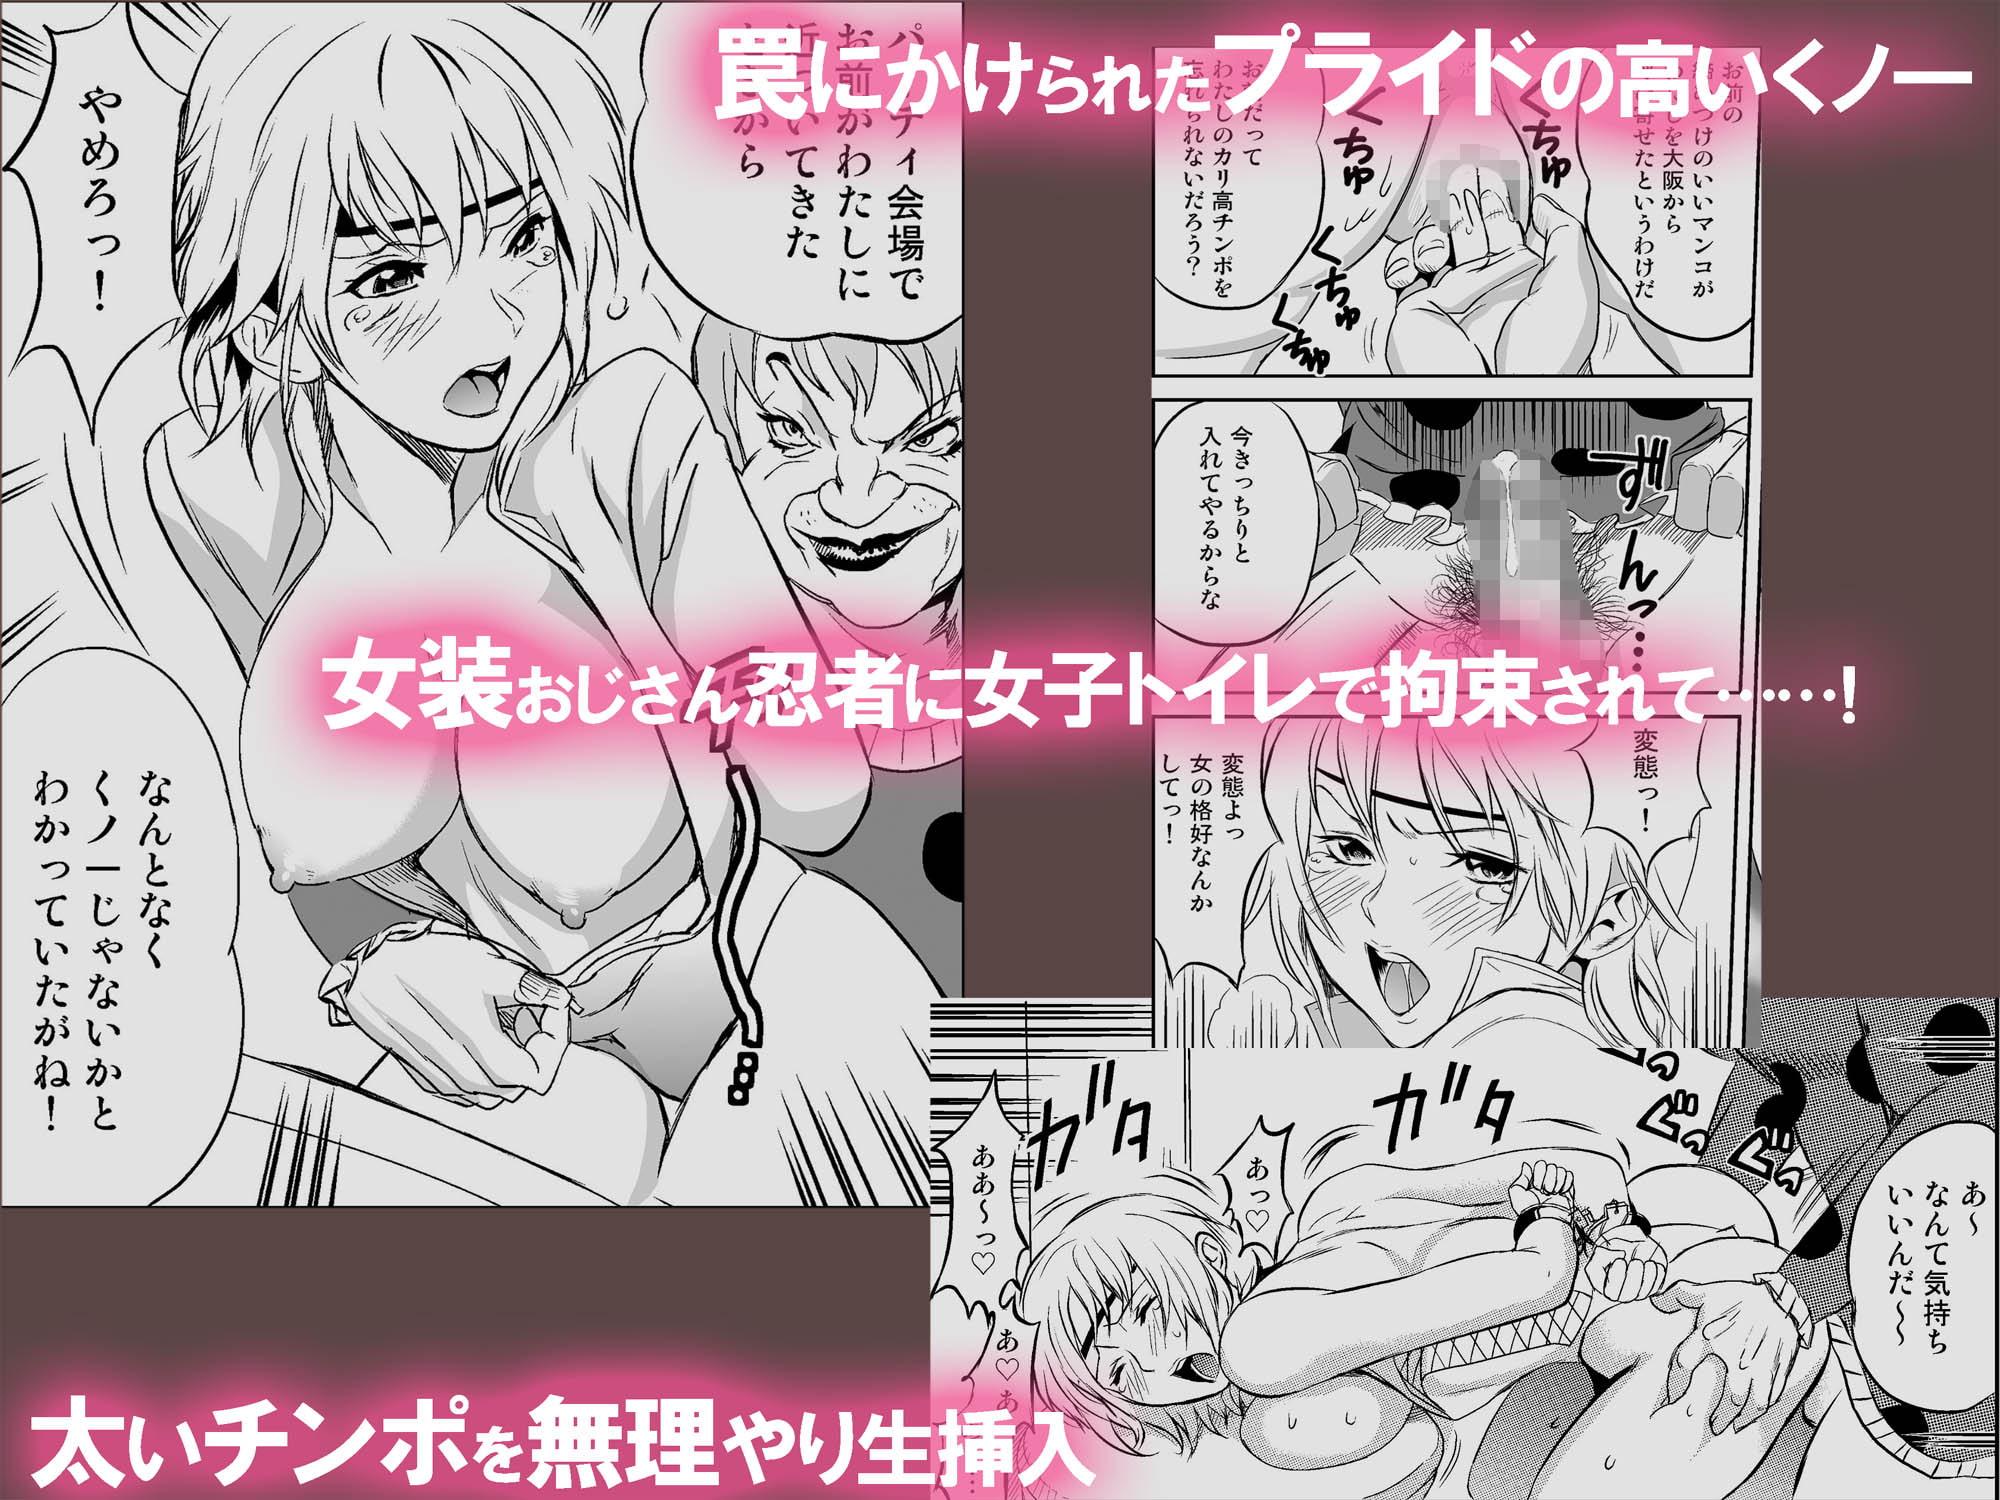 OLくノ一 どすけべミッション Vol.2 女の武器を駆使する美人OLは罠にかかって獣じみえたあえぎ声をあげた